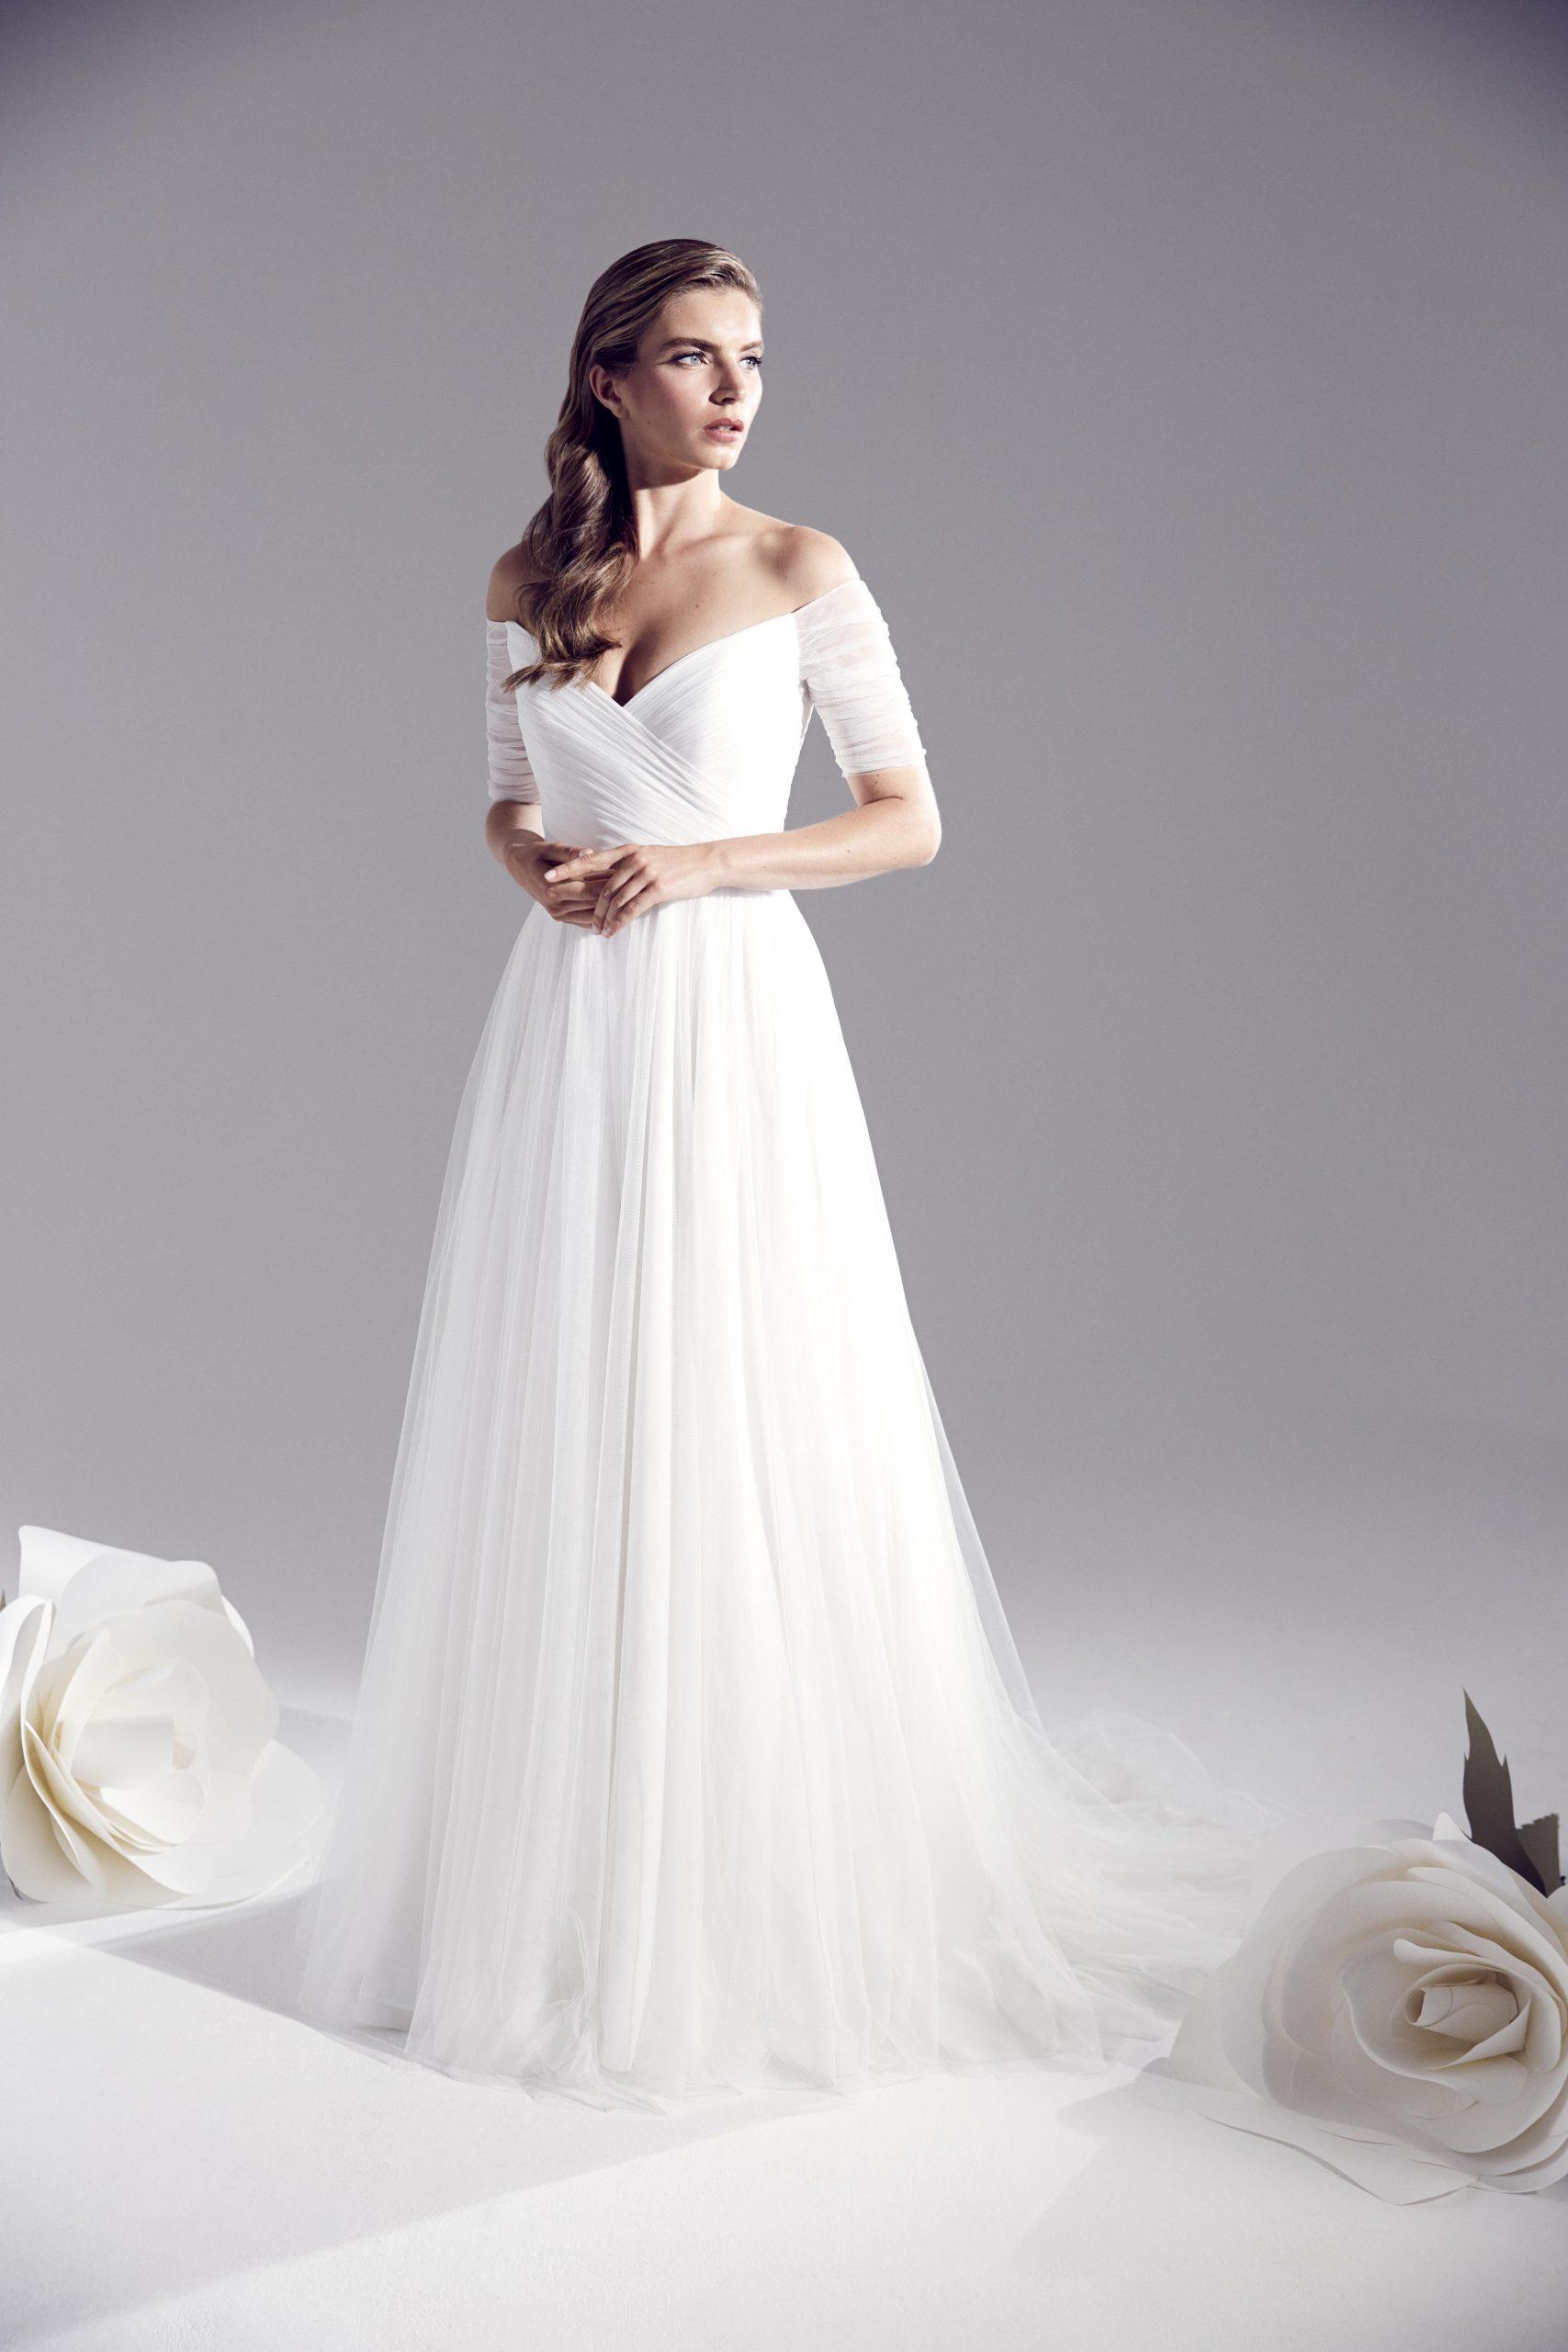 Dein Perfektes Brautkleid ️ Iay Iamyours Brautmode